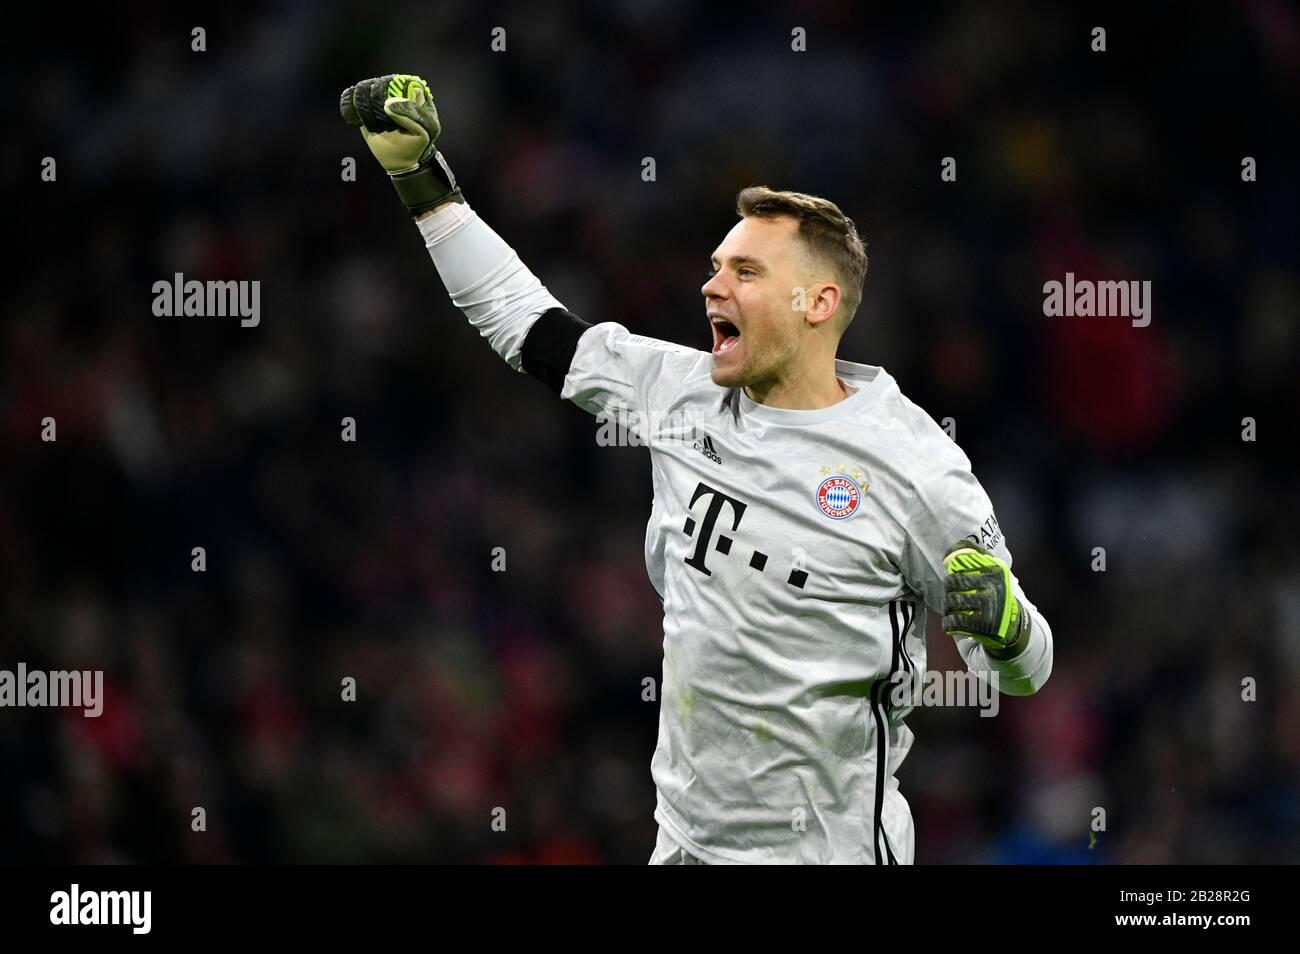 Cartel /> Bayern Munich /> Baviera capitán Manuel Neuer